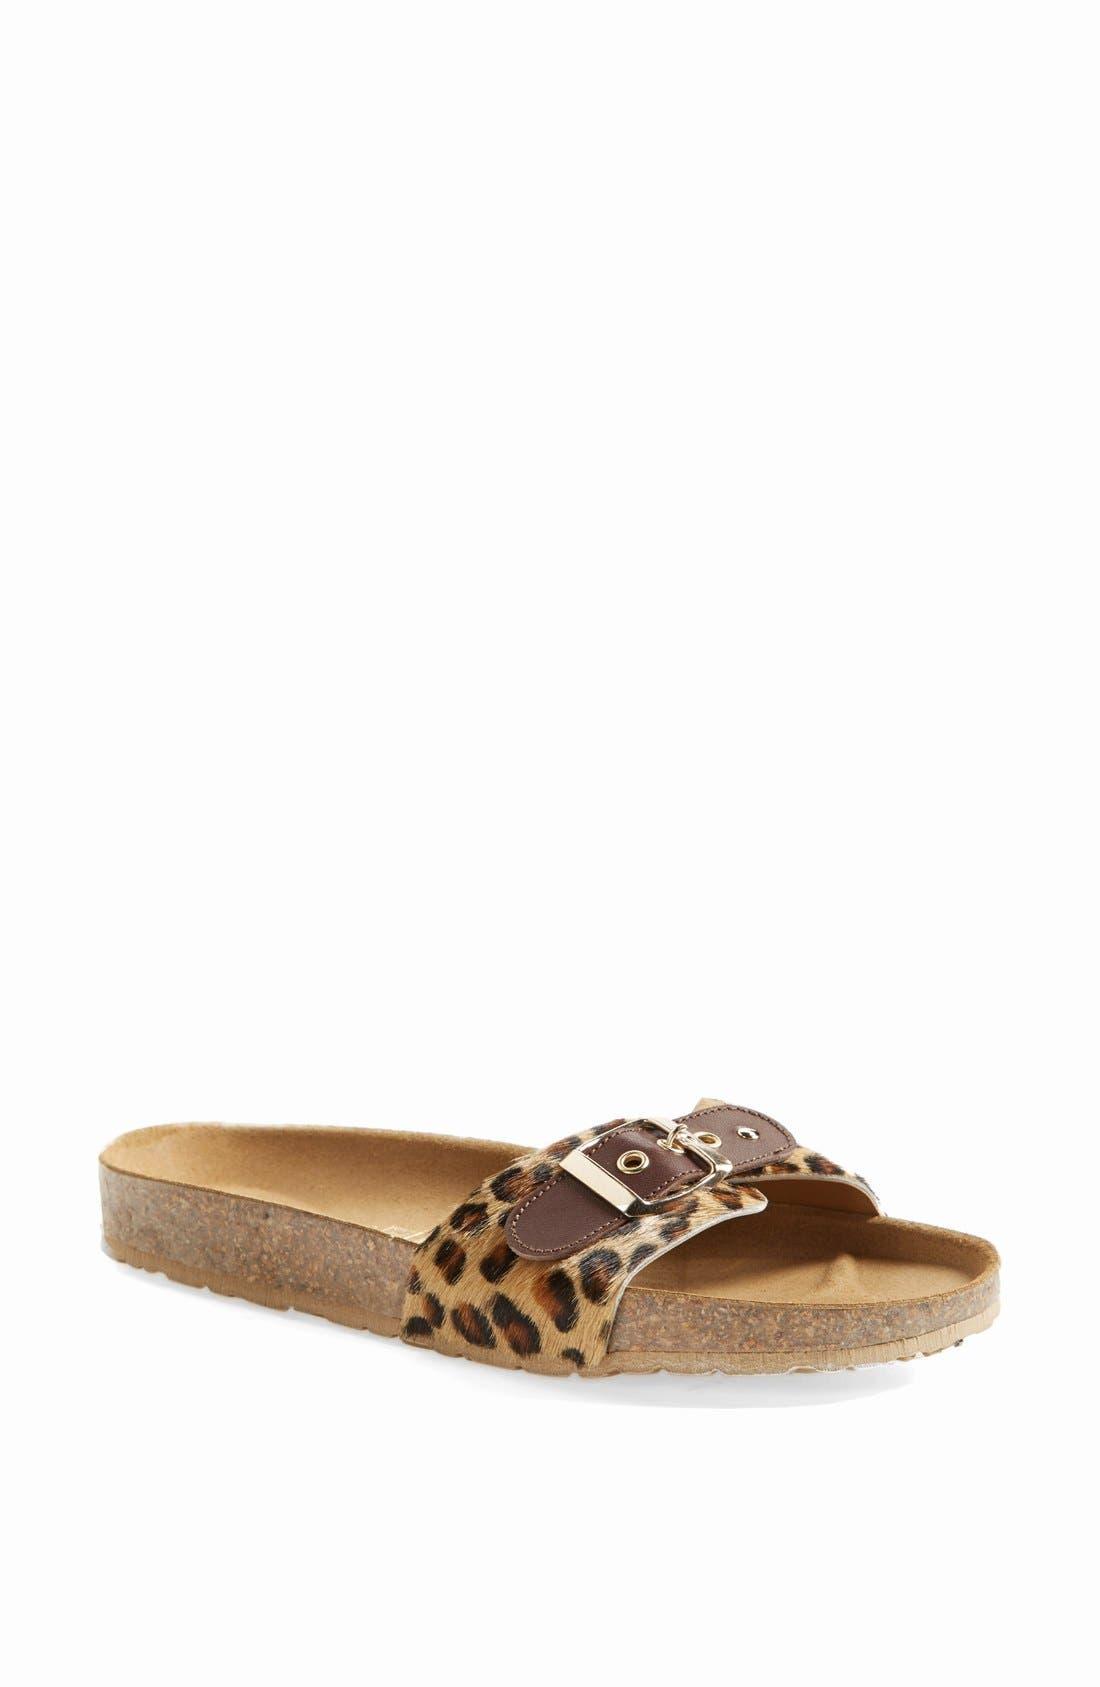 Main Image - Seychelles 'So Far Away' Leopard Print Calf Hair Sandal